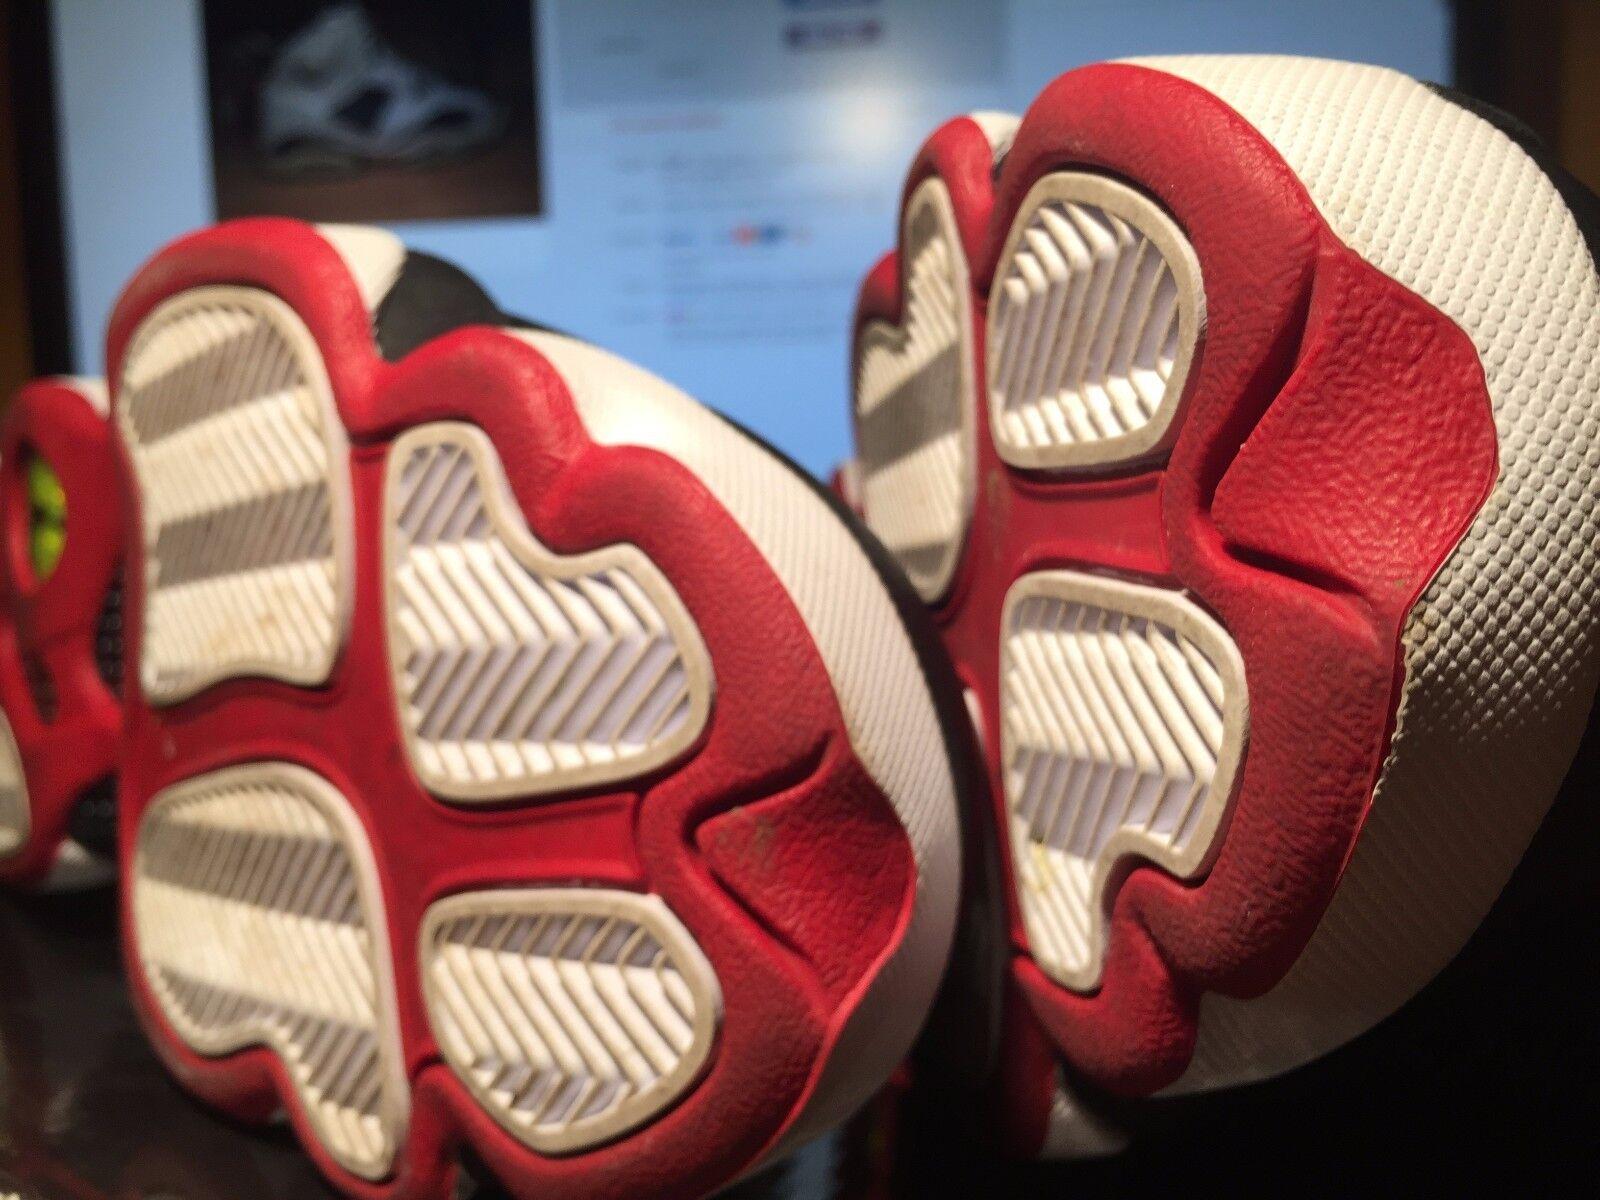 Nike retro air jordan 13 retro Nike (playoff) - größe 10,5 67ec25